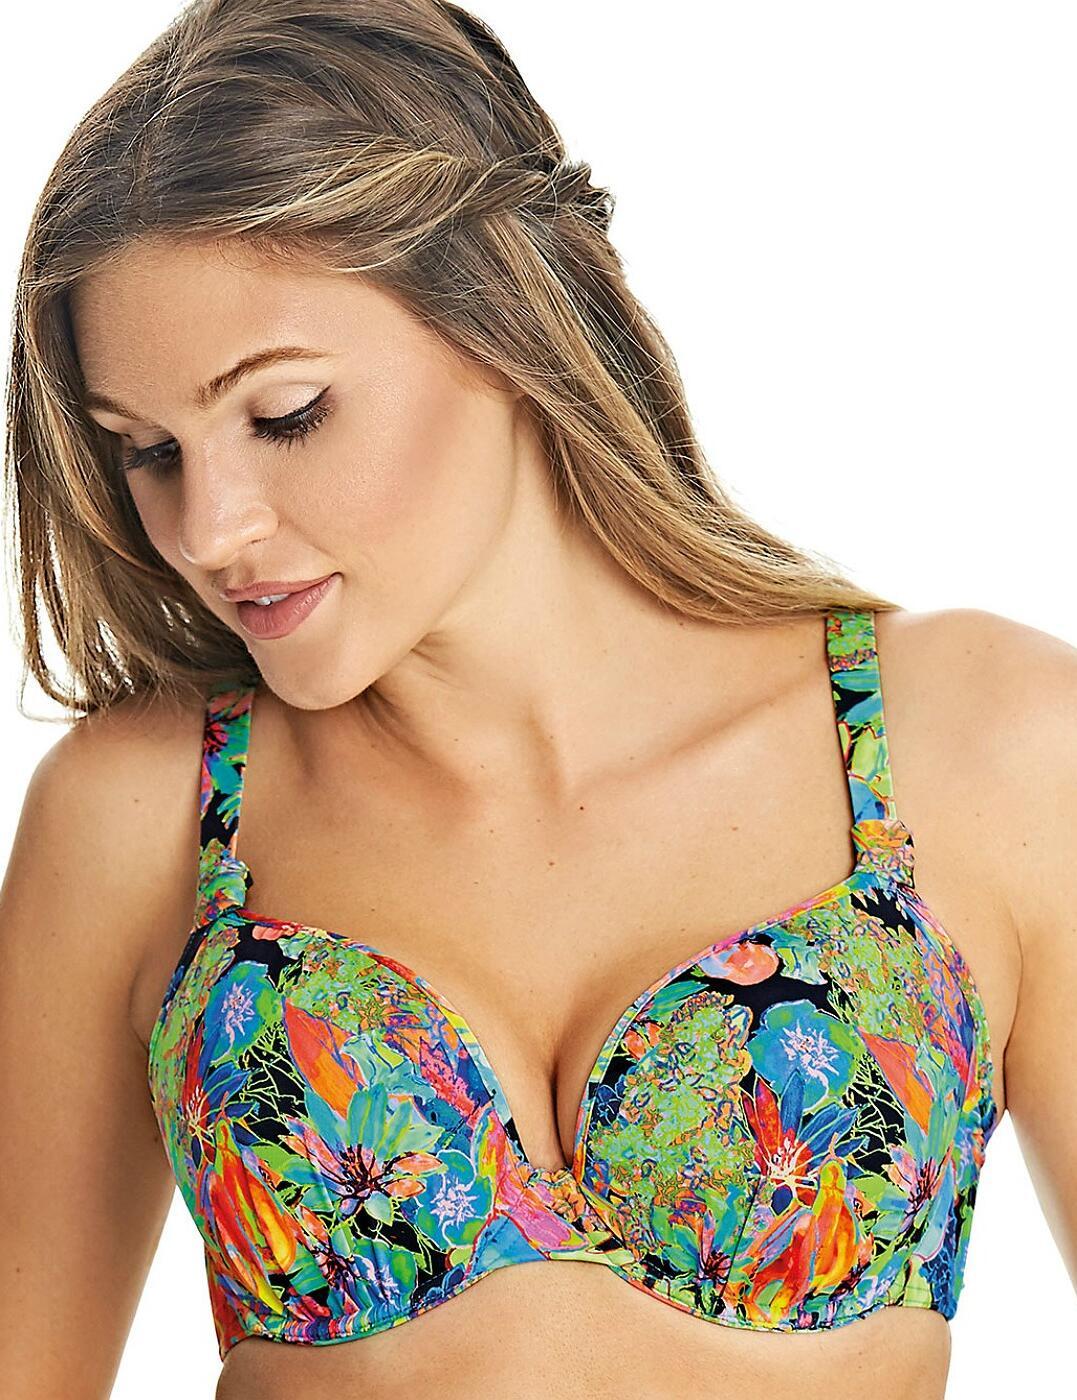 2985 Freya Island Girl Underwired Bandless Deco Moulded Bikini Top - 2985 Black